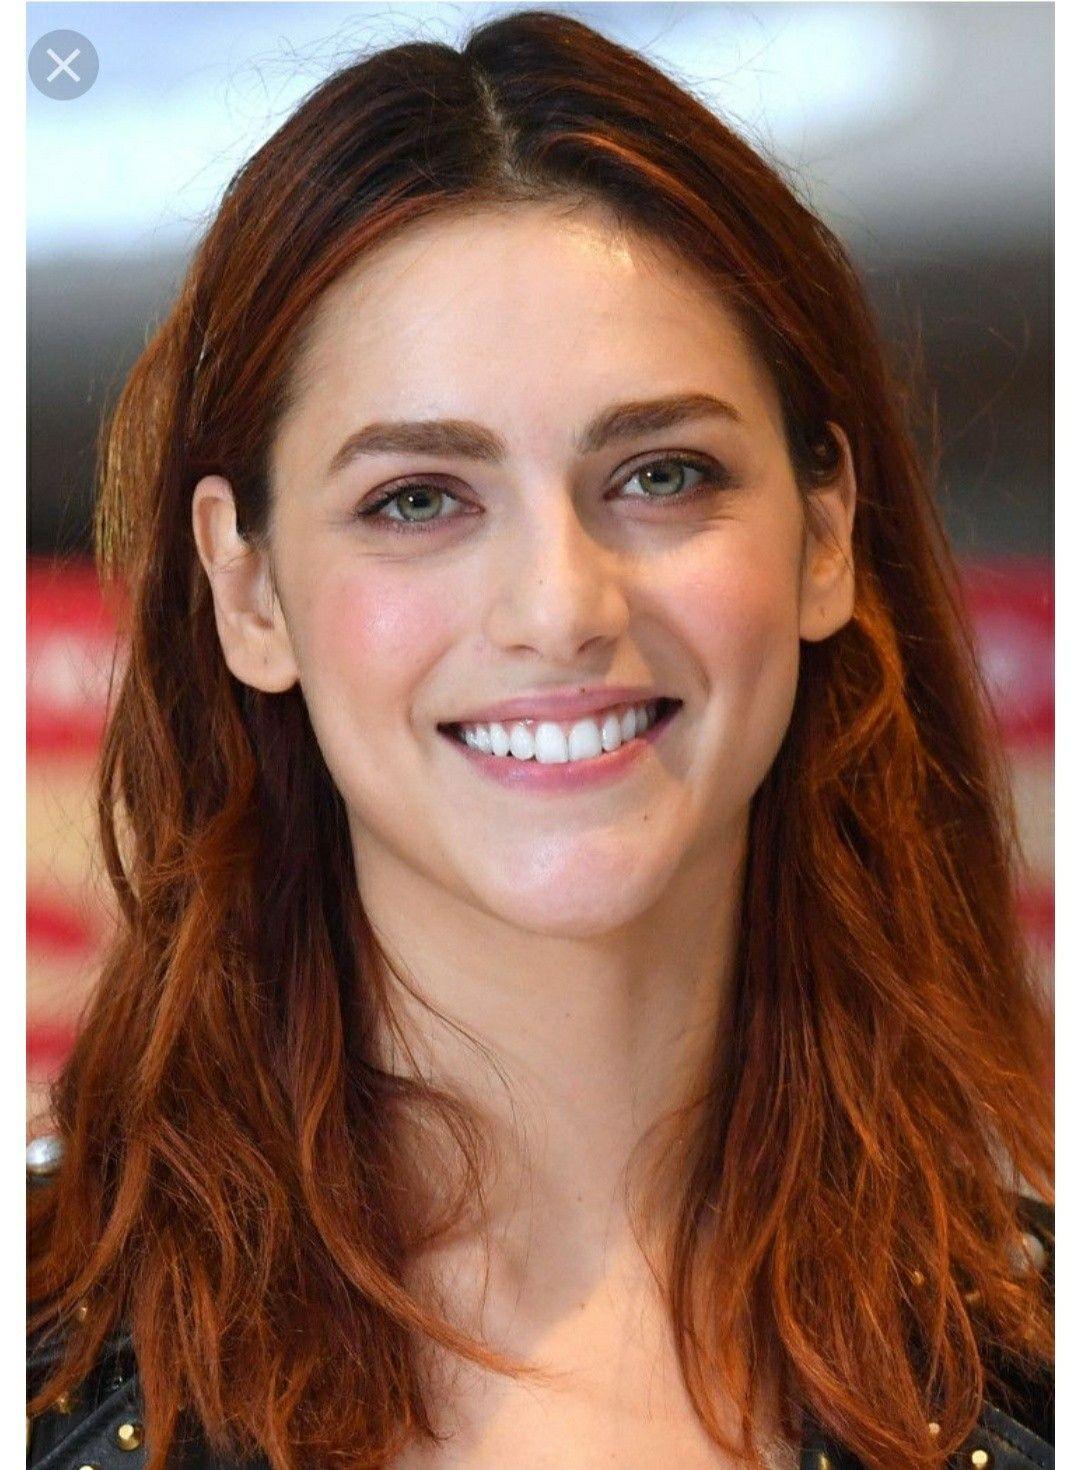 Pin di Moreno su Miriam | Bel viso, Acconciature rosse ...